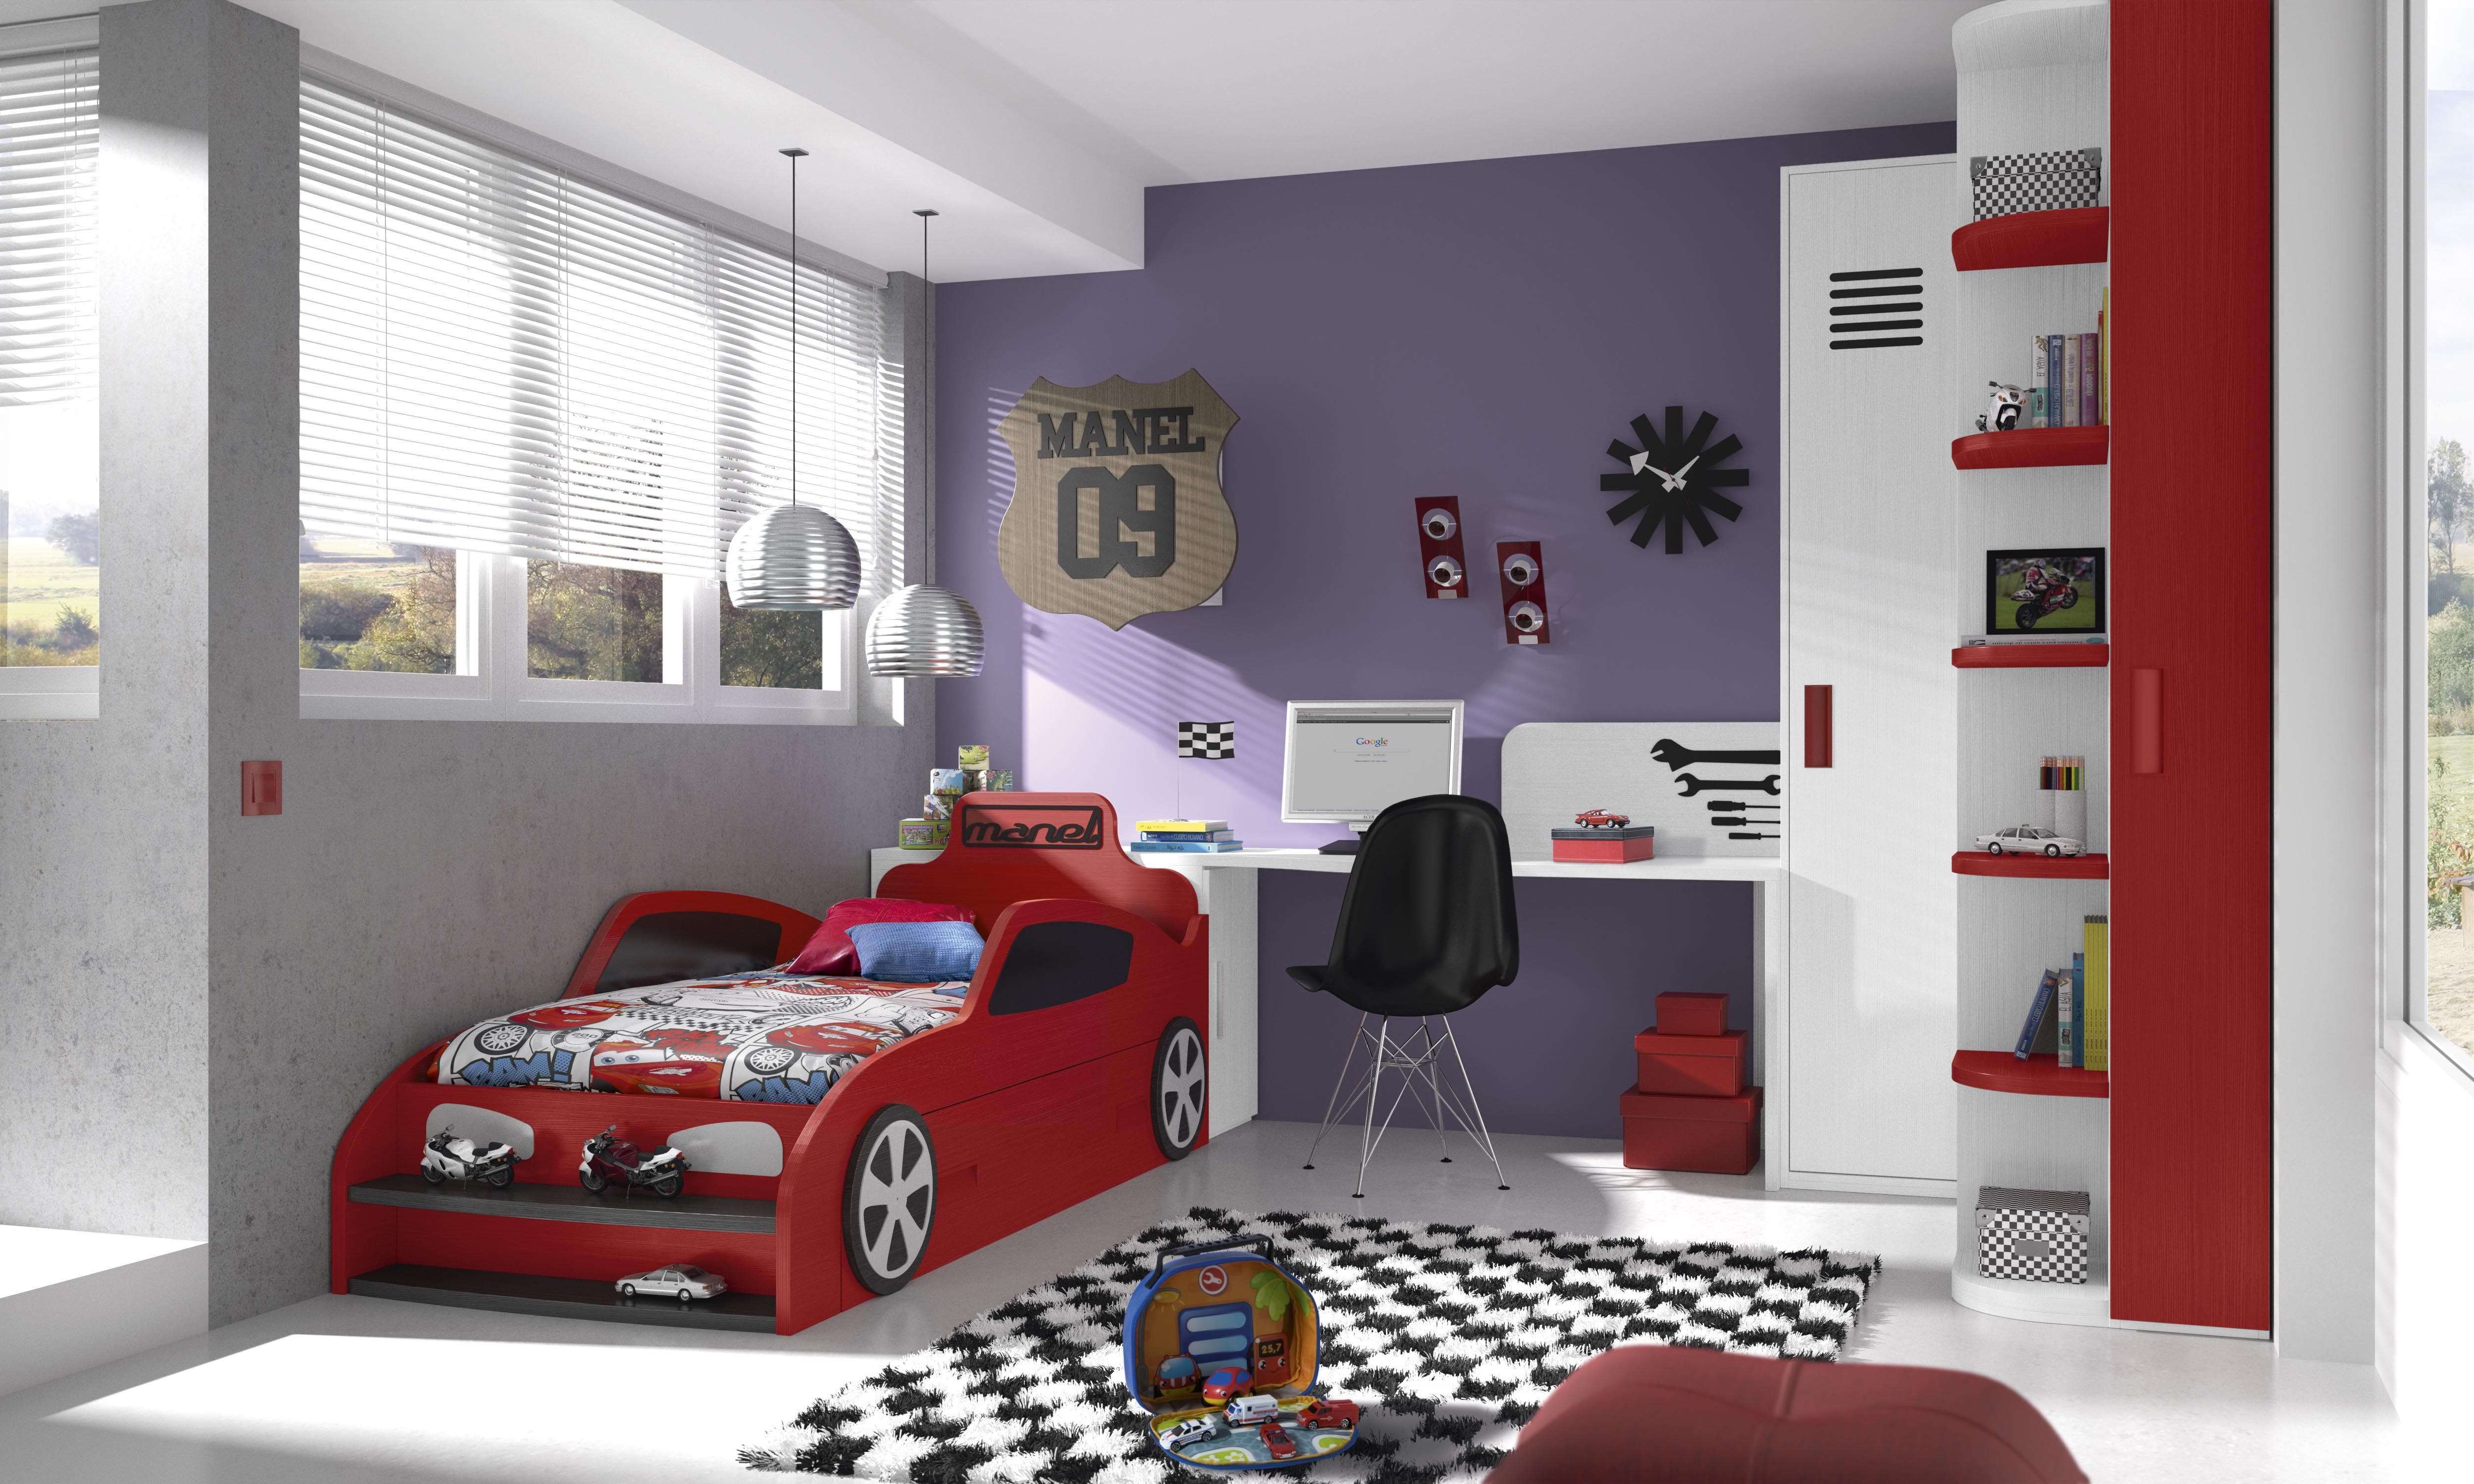 Habitaciones infantiles tem ticas dibujos animados coches2 - Decoraciones habitaciones infantiles ...